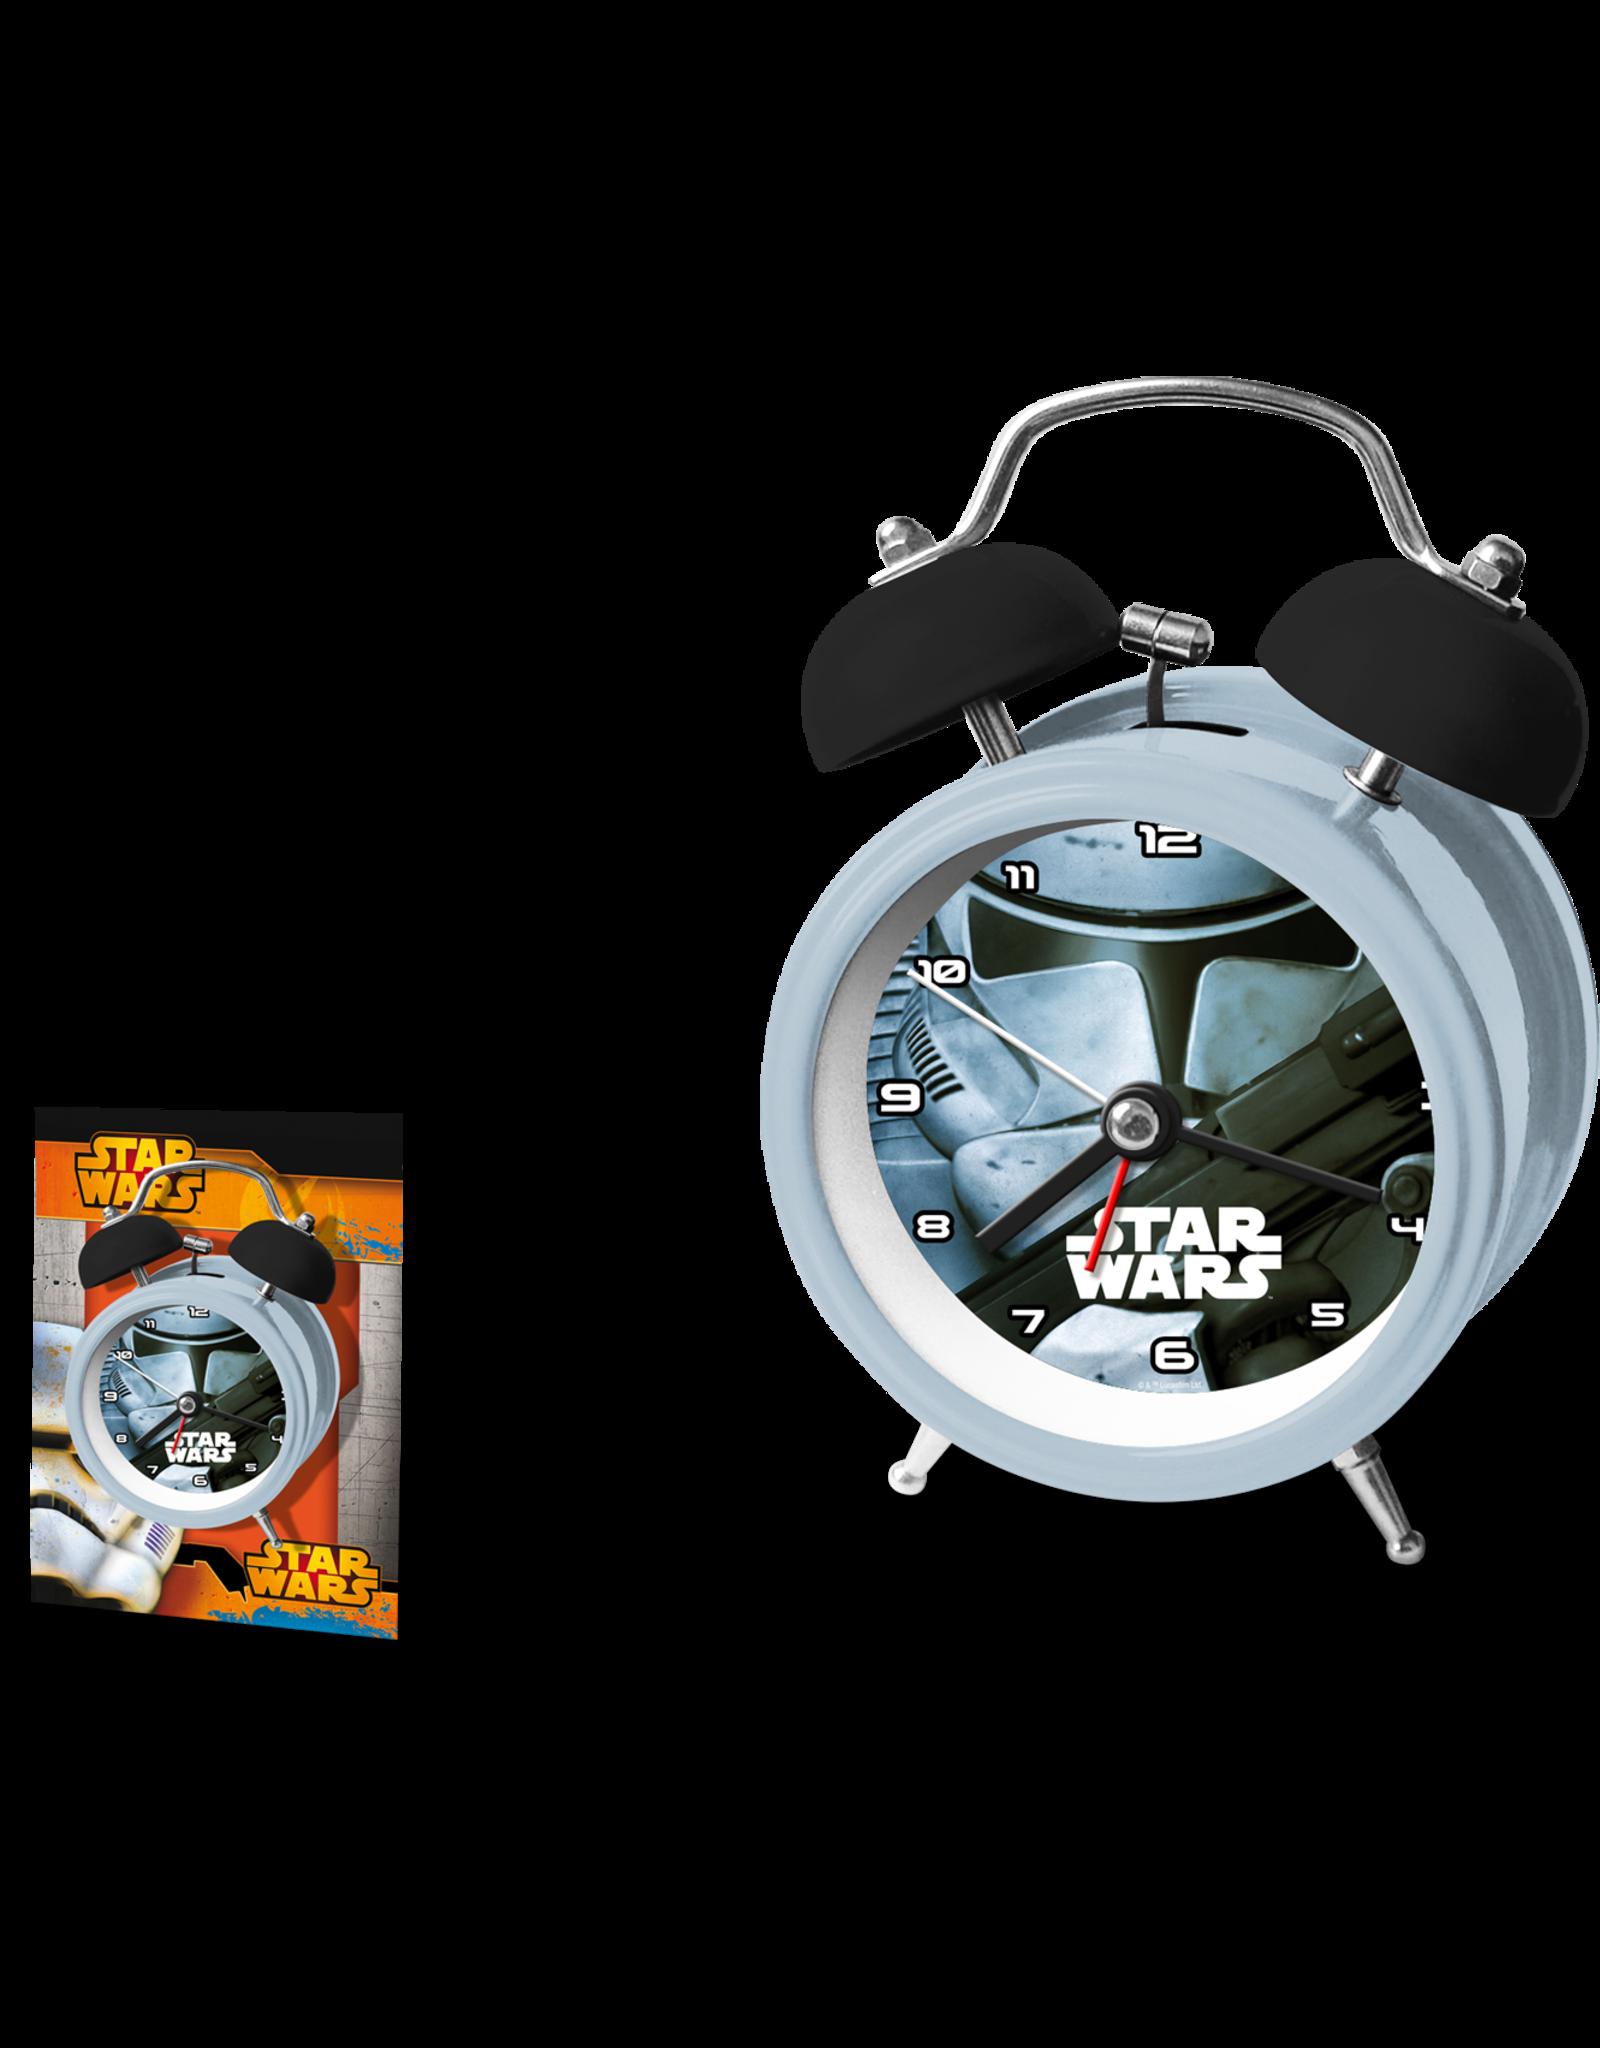 Euroswan STAR WARS Twinbell Alarm Clock - Trooper